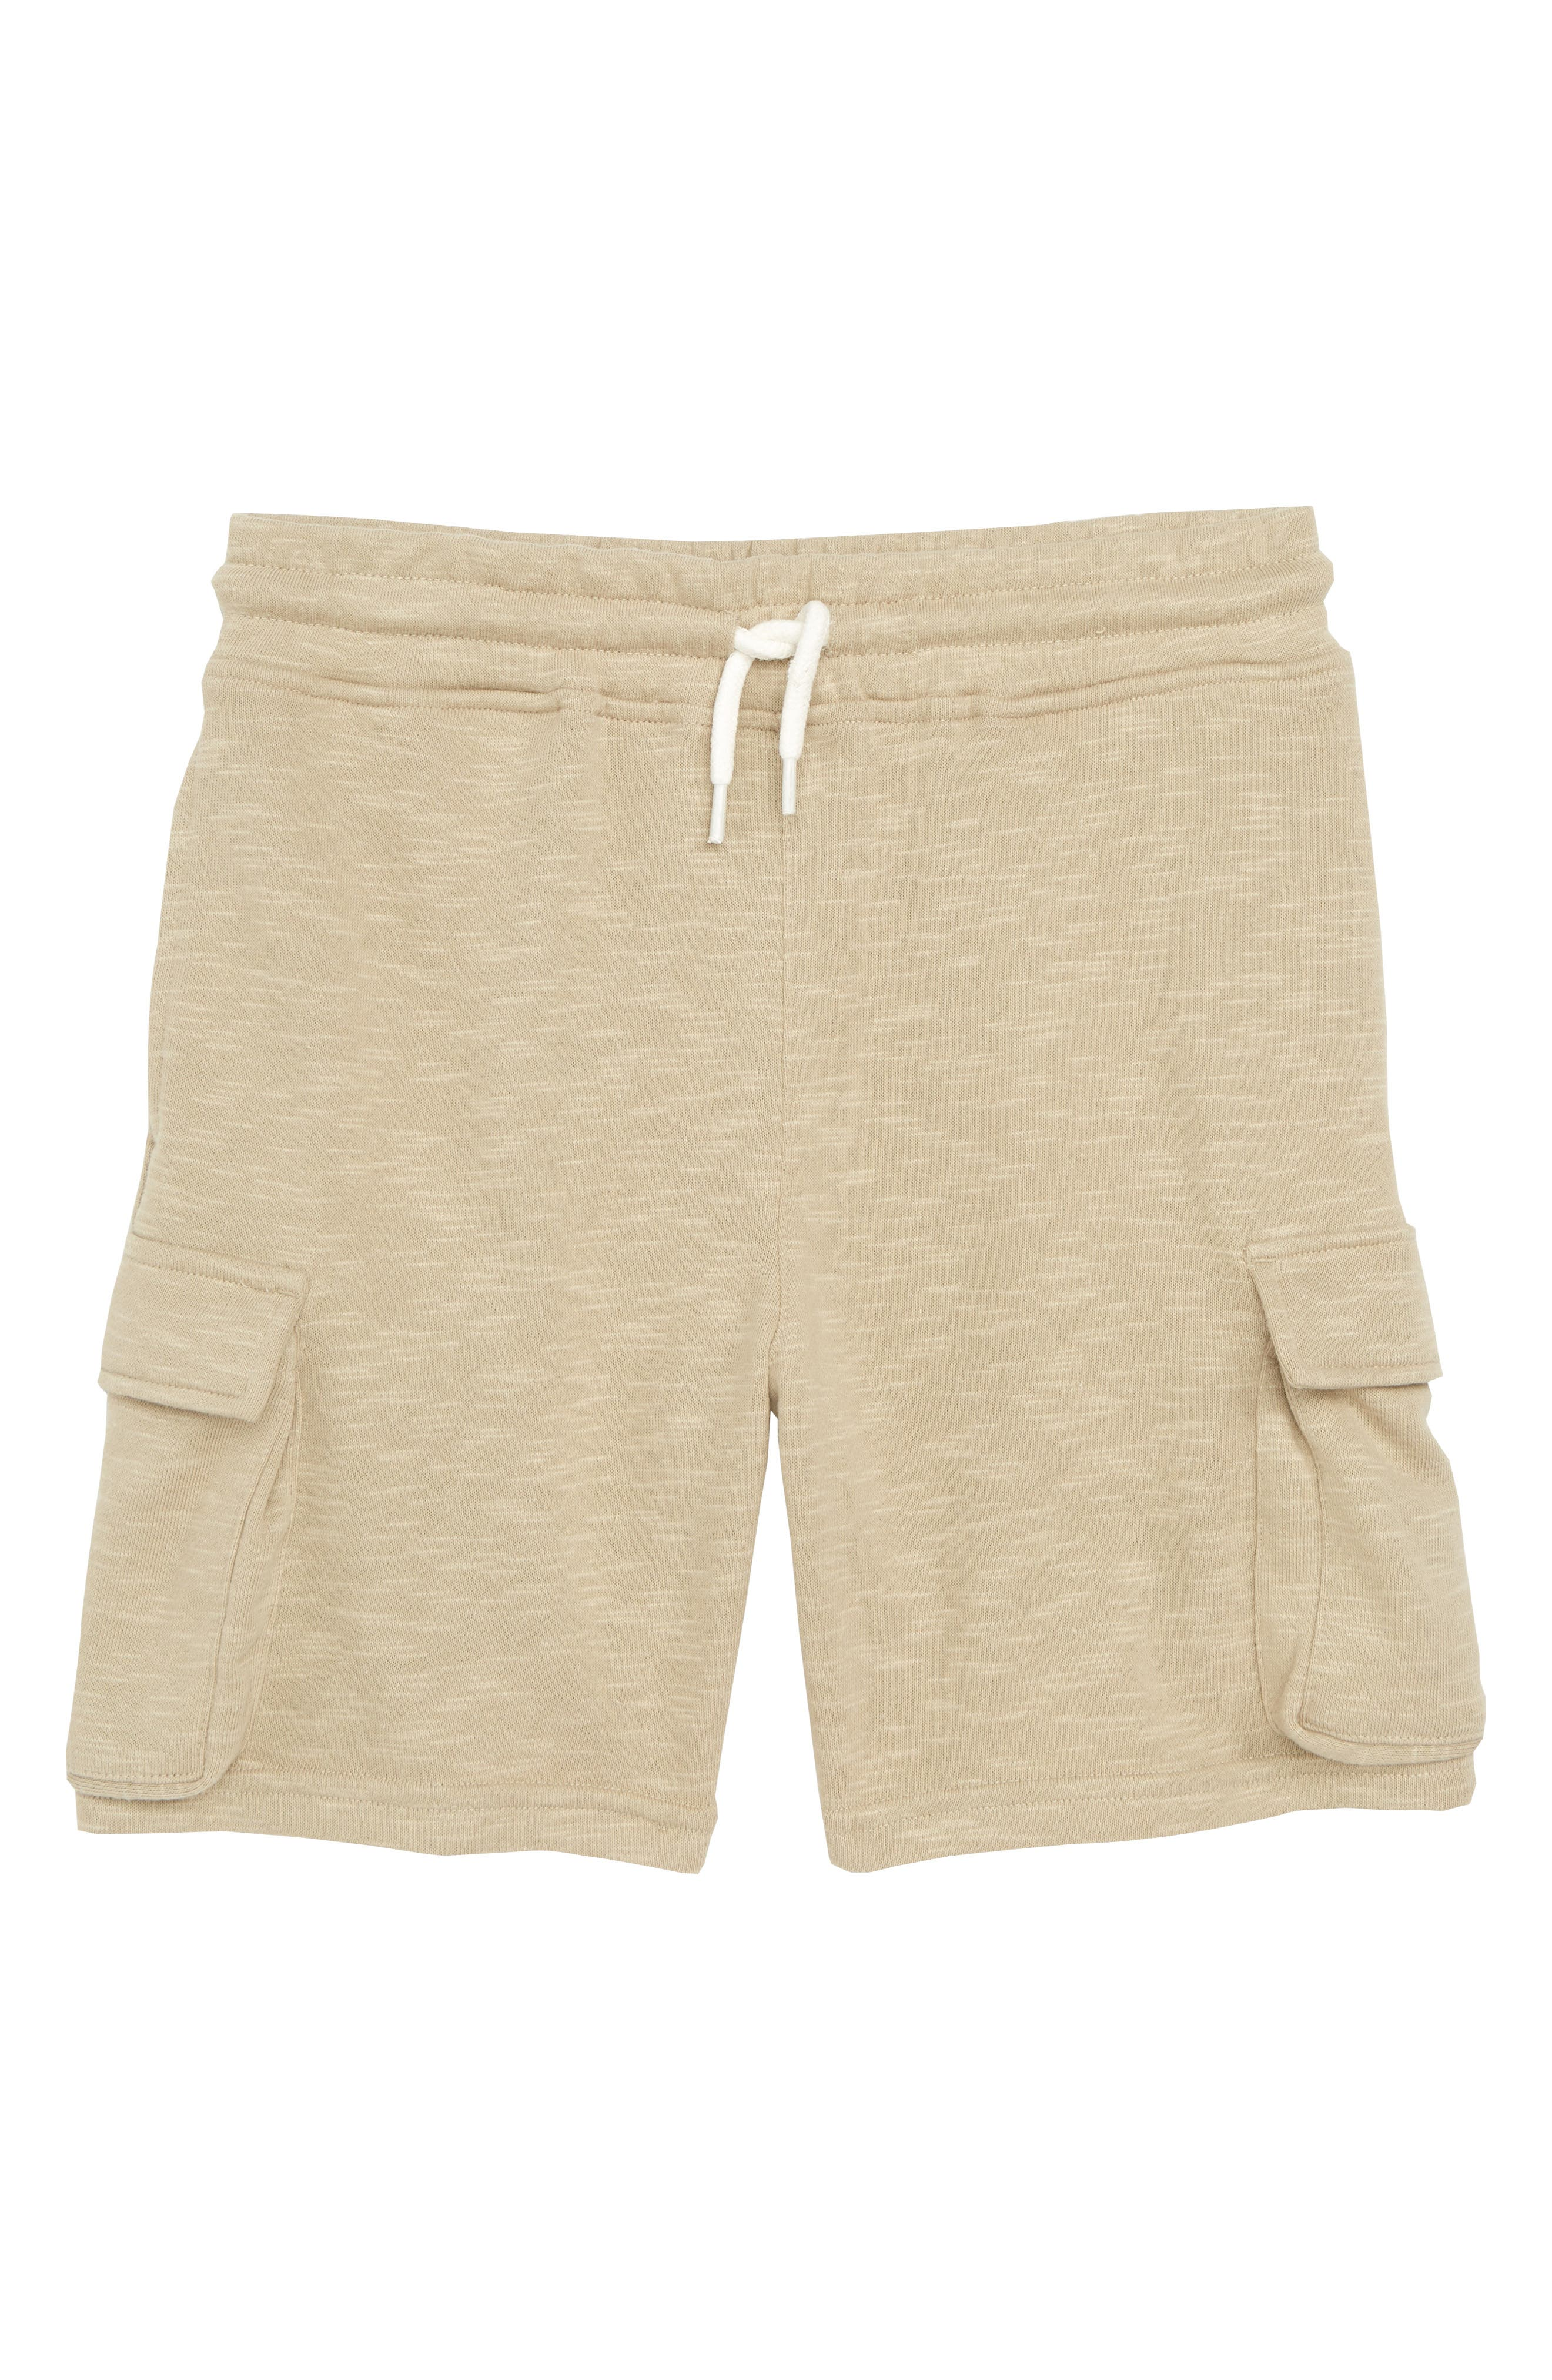 Cargo Shorts,                         Main,                         color, SAND